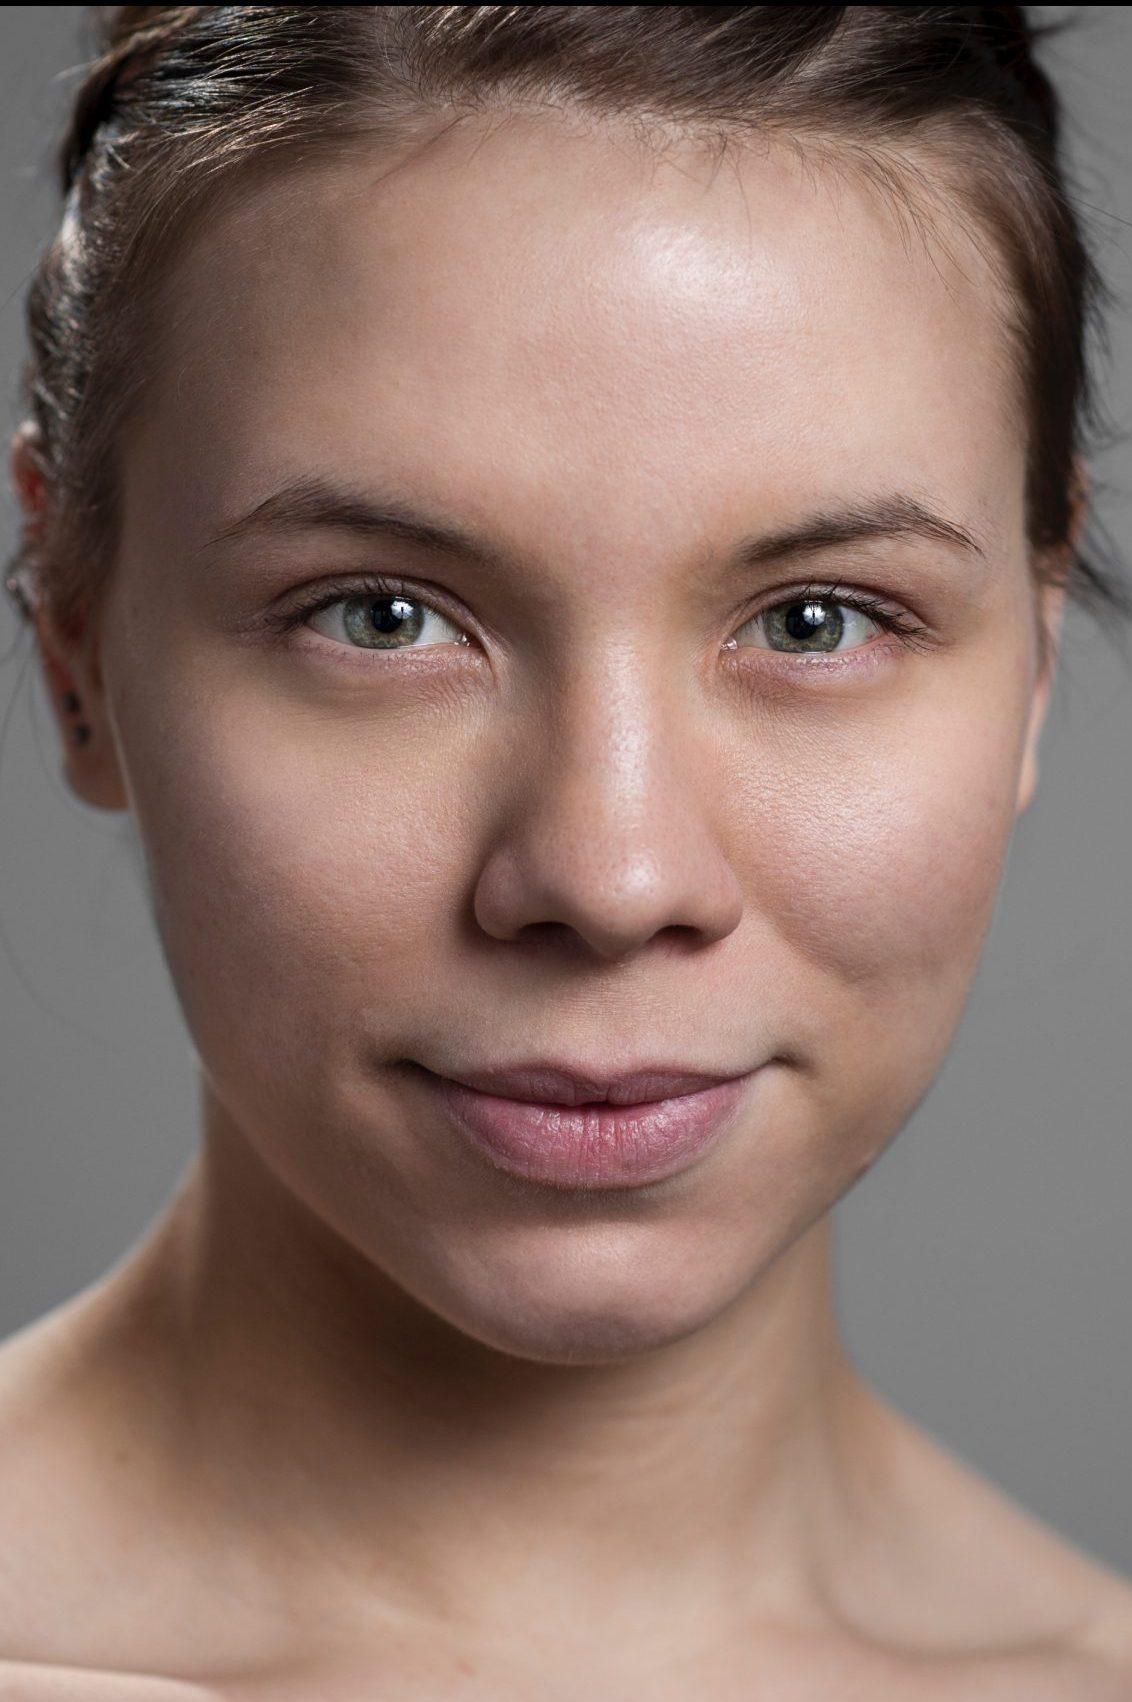 Marika Renhuvud – Pawel Iwanow